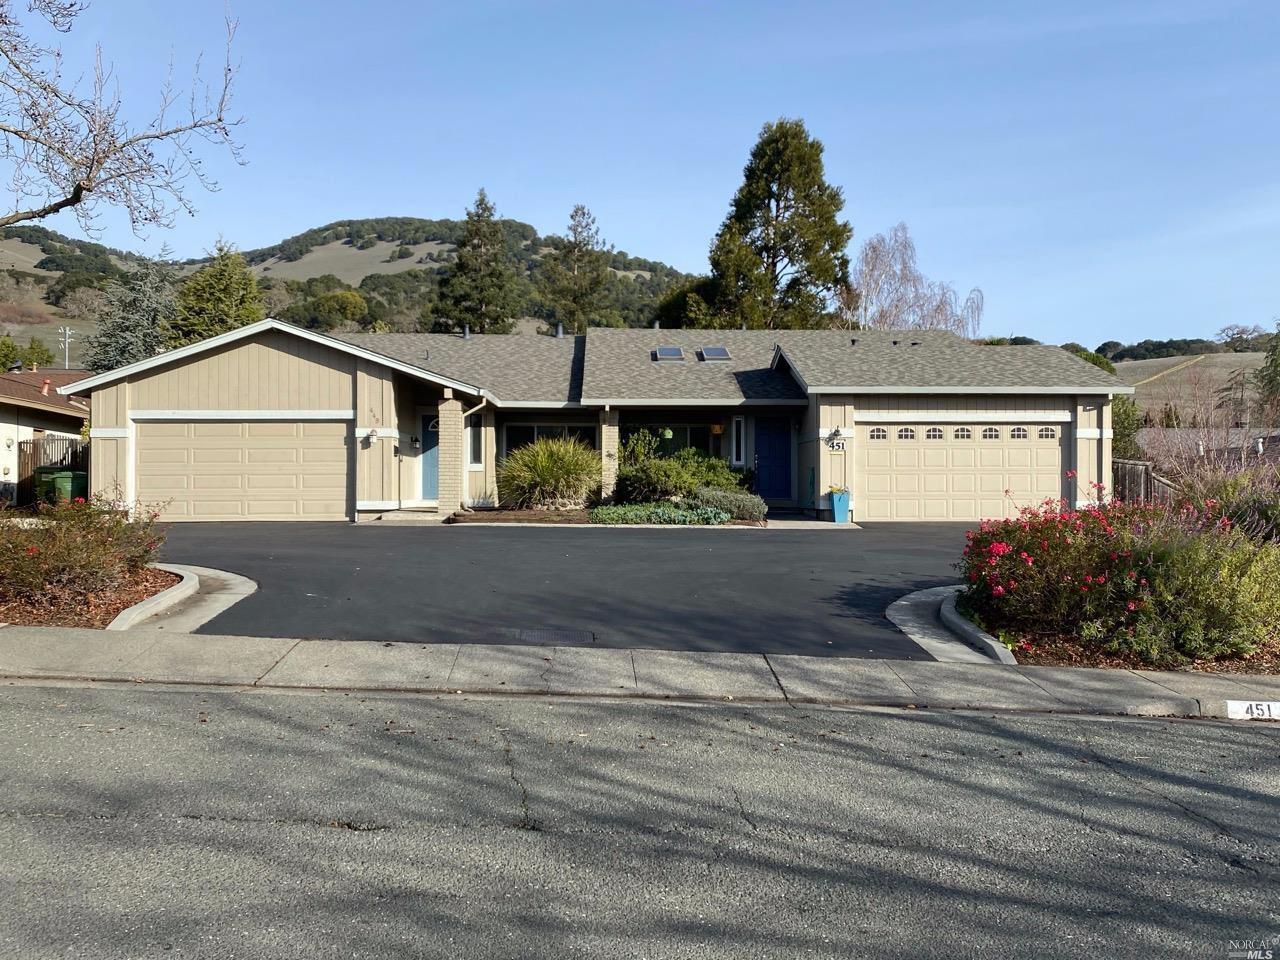 449 San Marin Dr, Novato, CA, 94945 United States